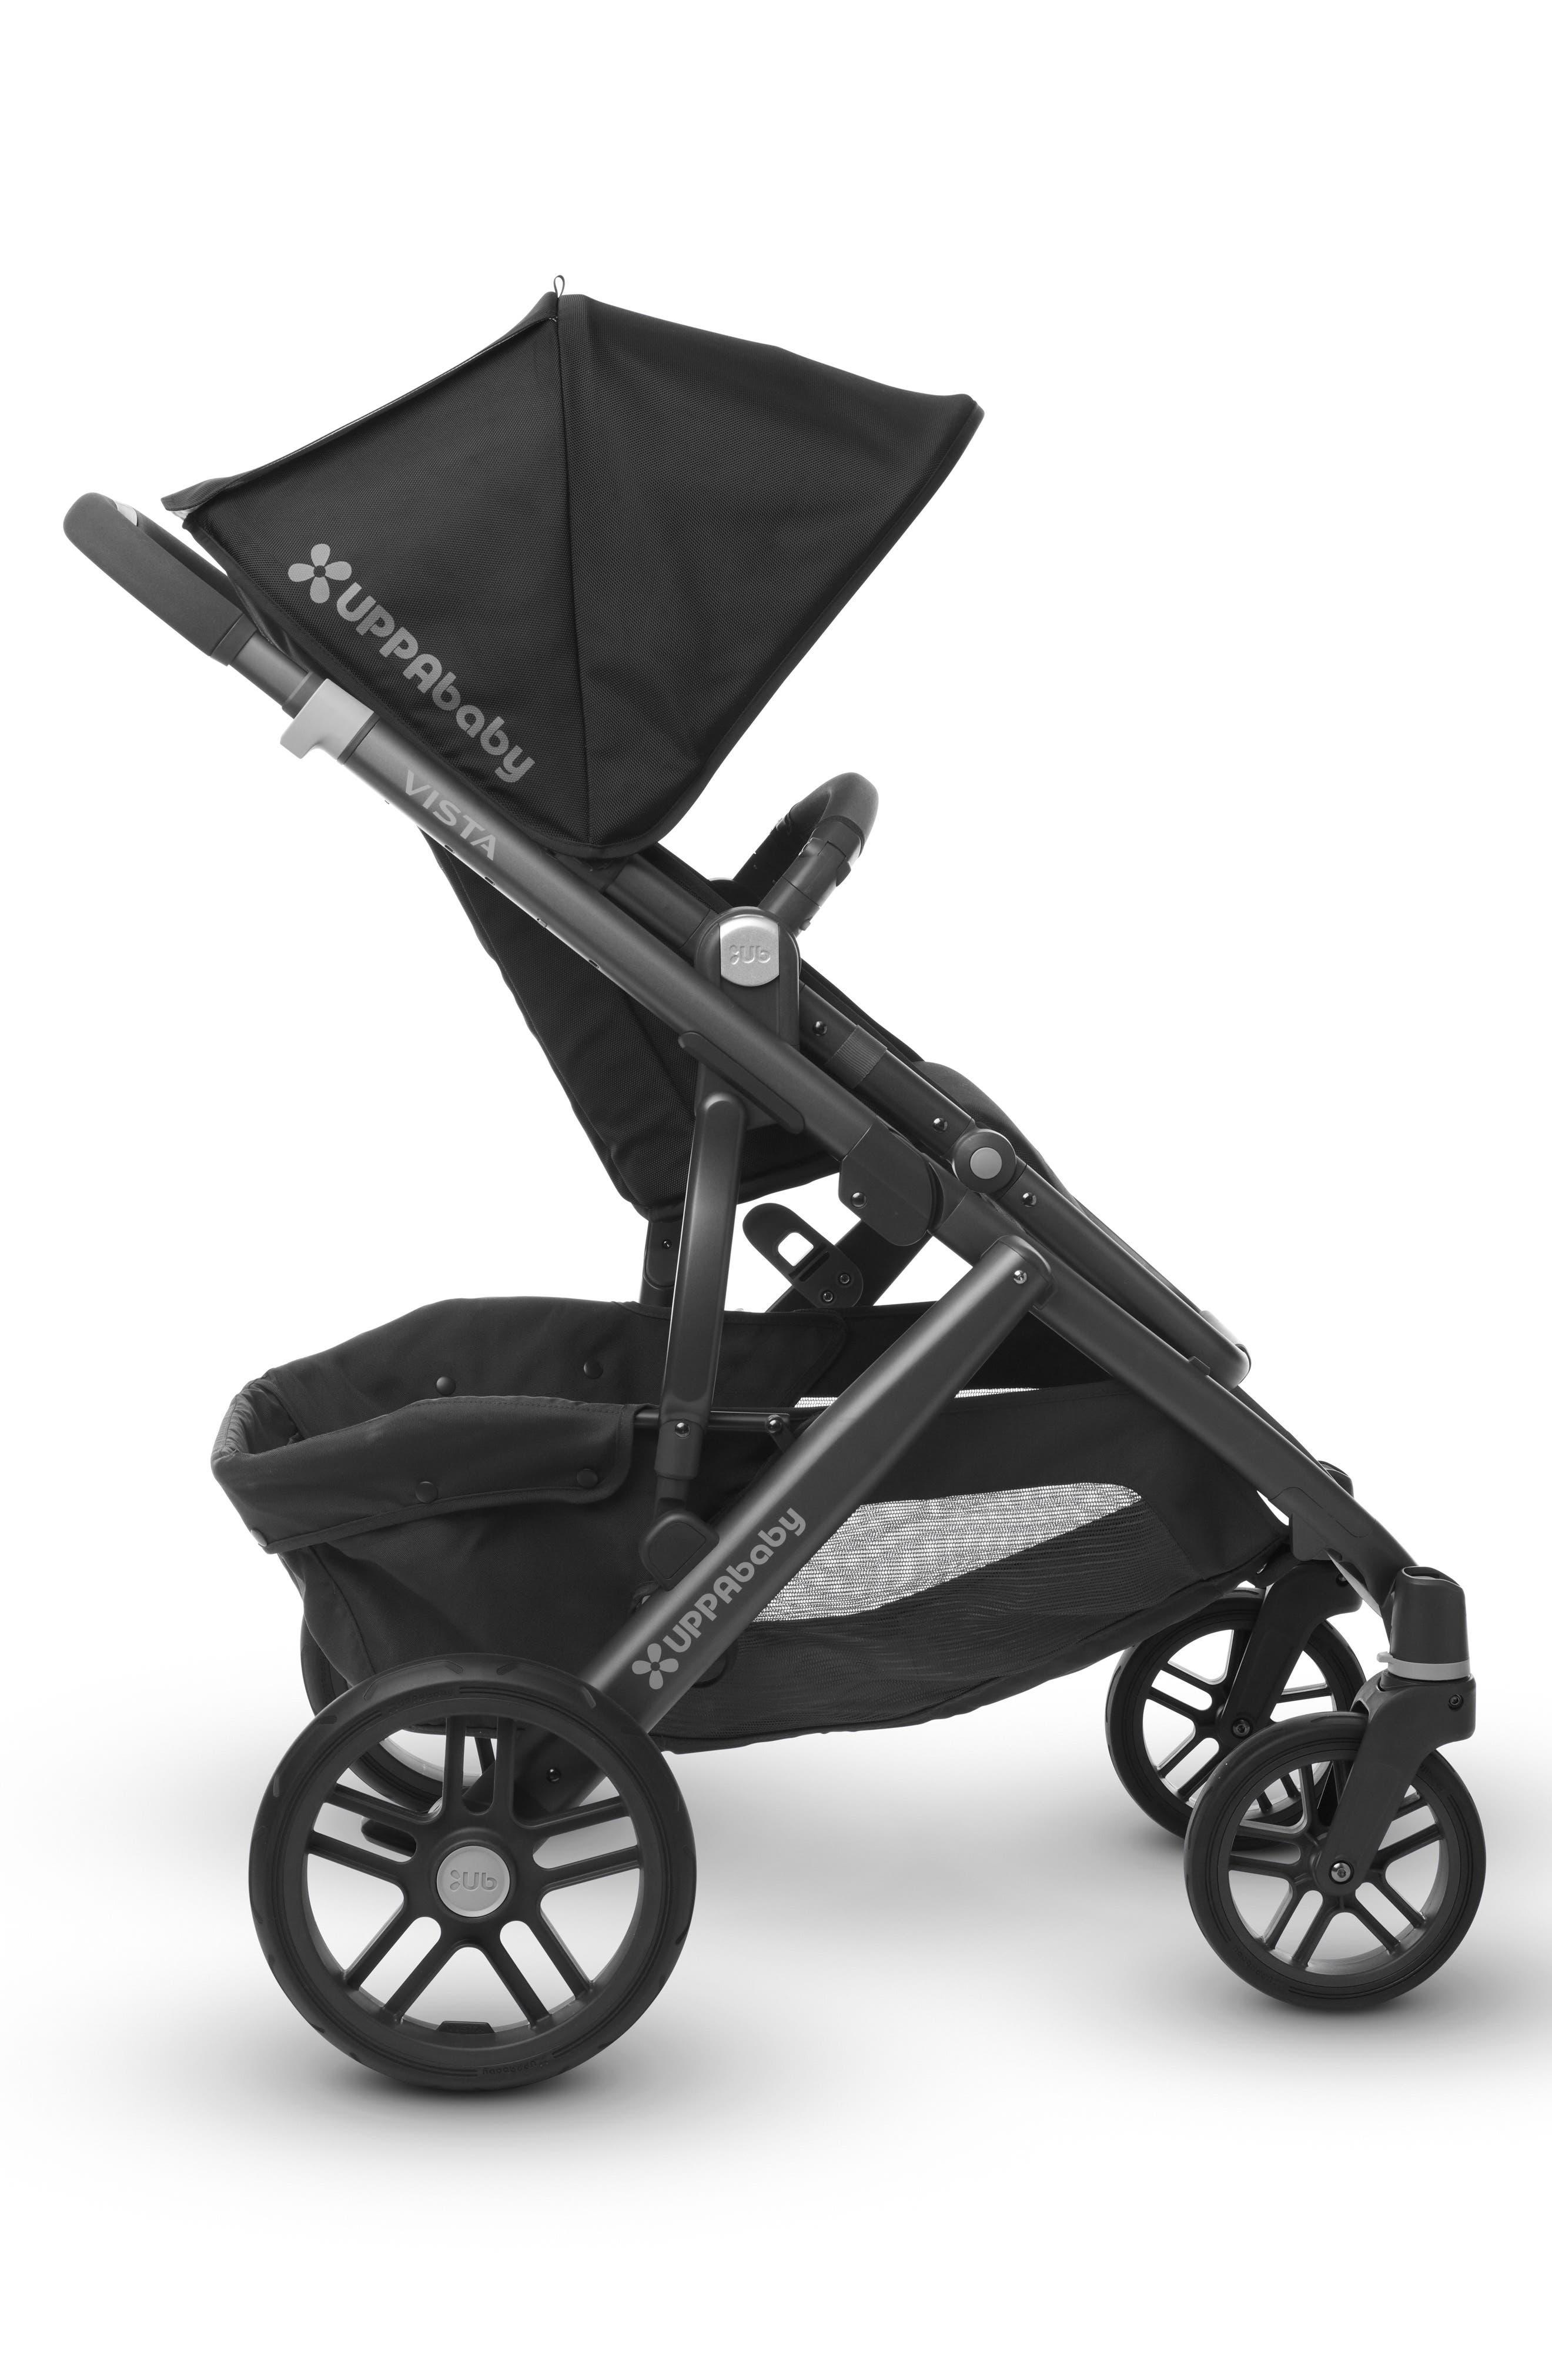 2017 VISTA Aluminum Frame Convertible Stroller with Bassinet & Toddler Seat,                             Alternate thumbnail 3, color,                             001